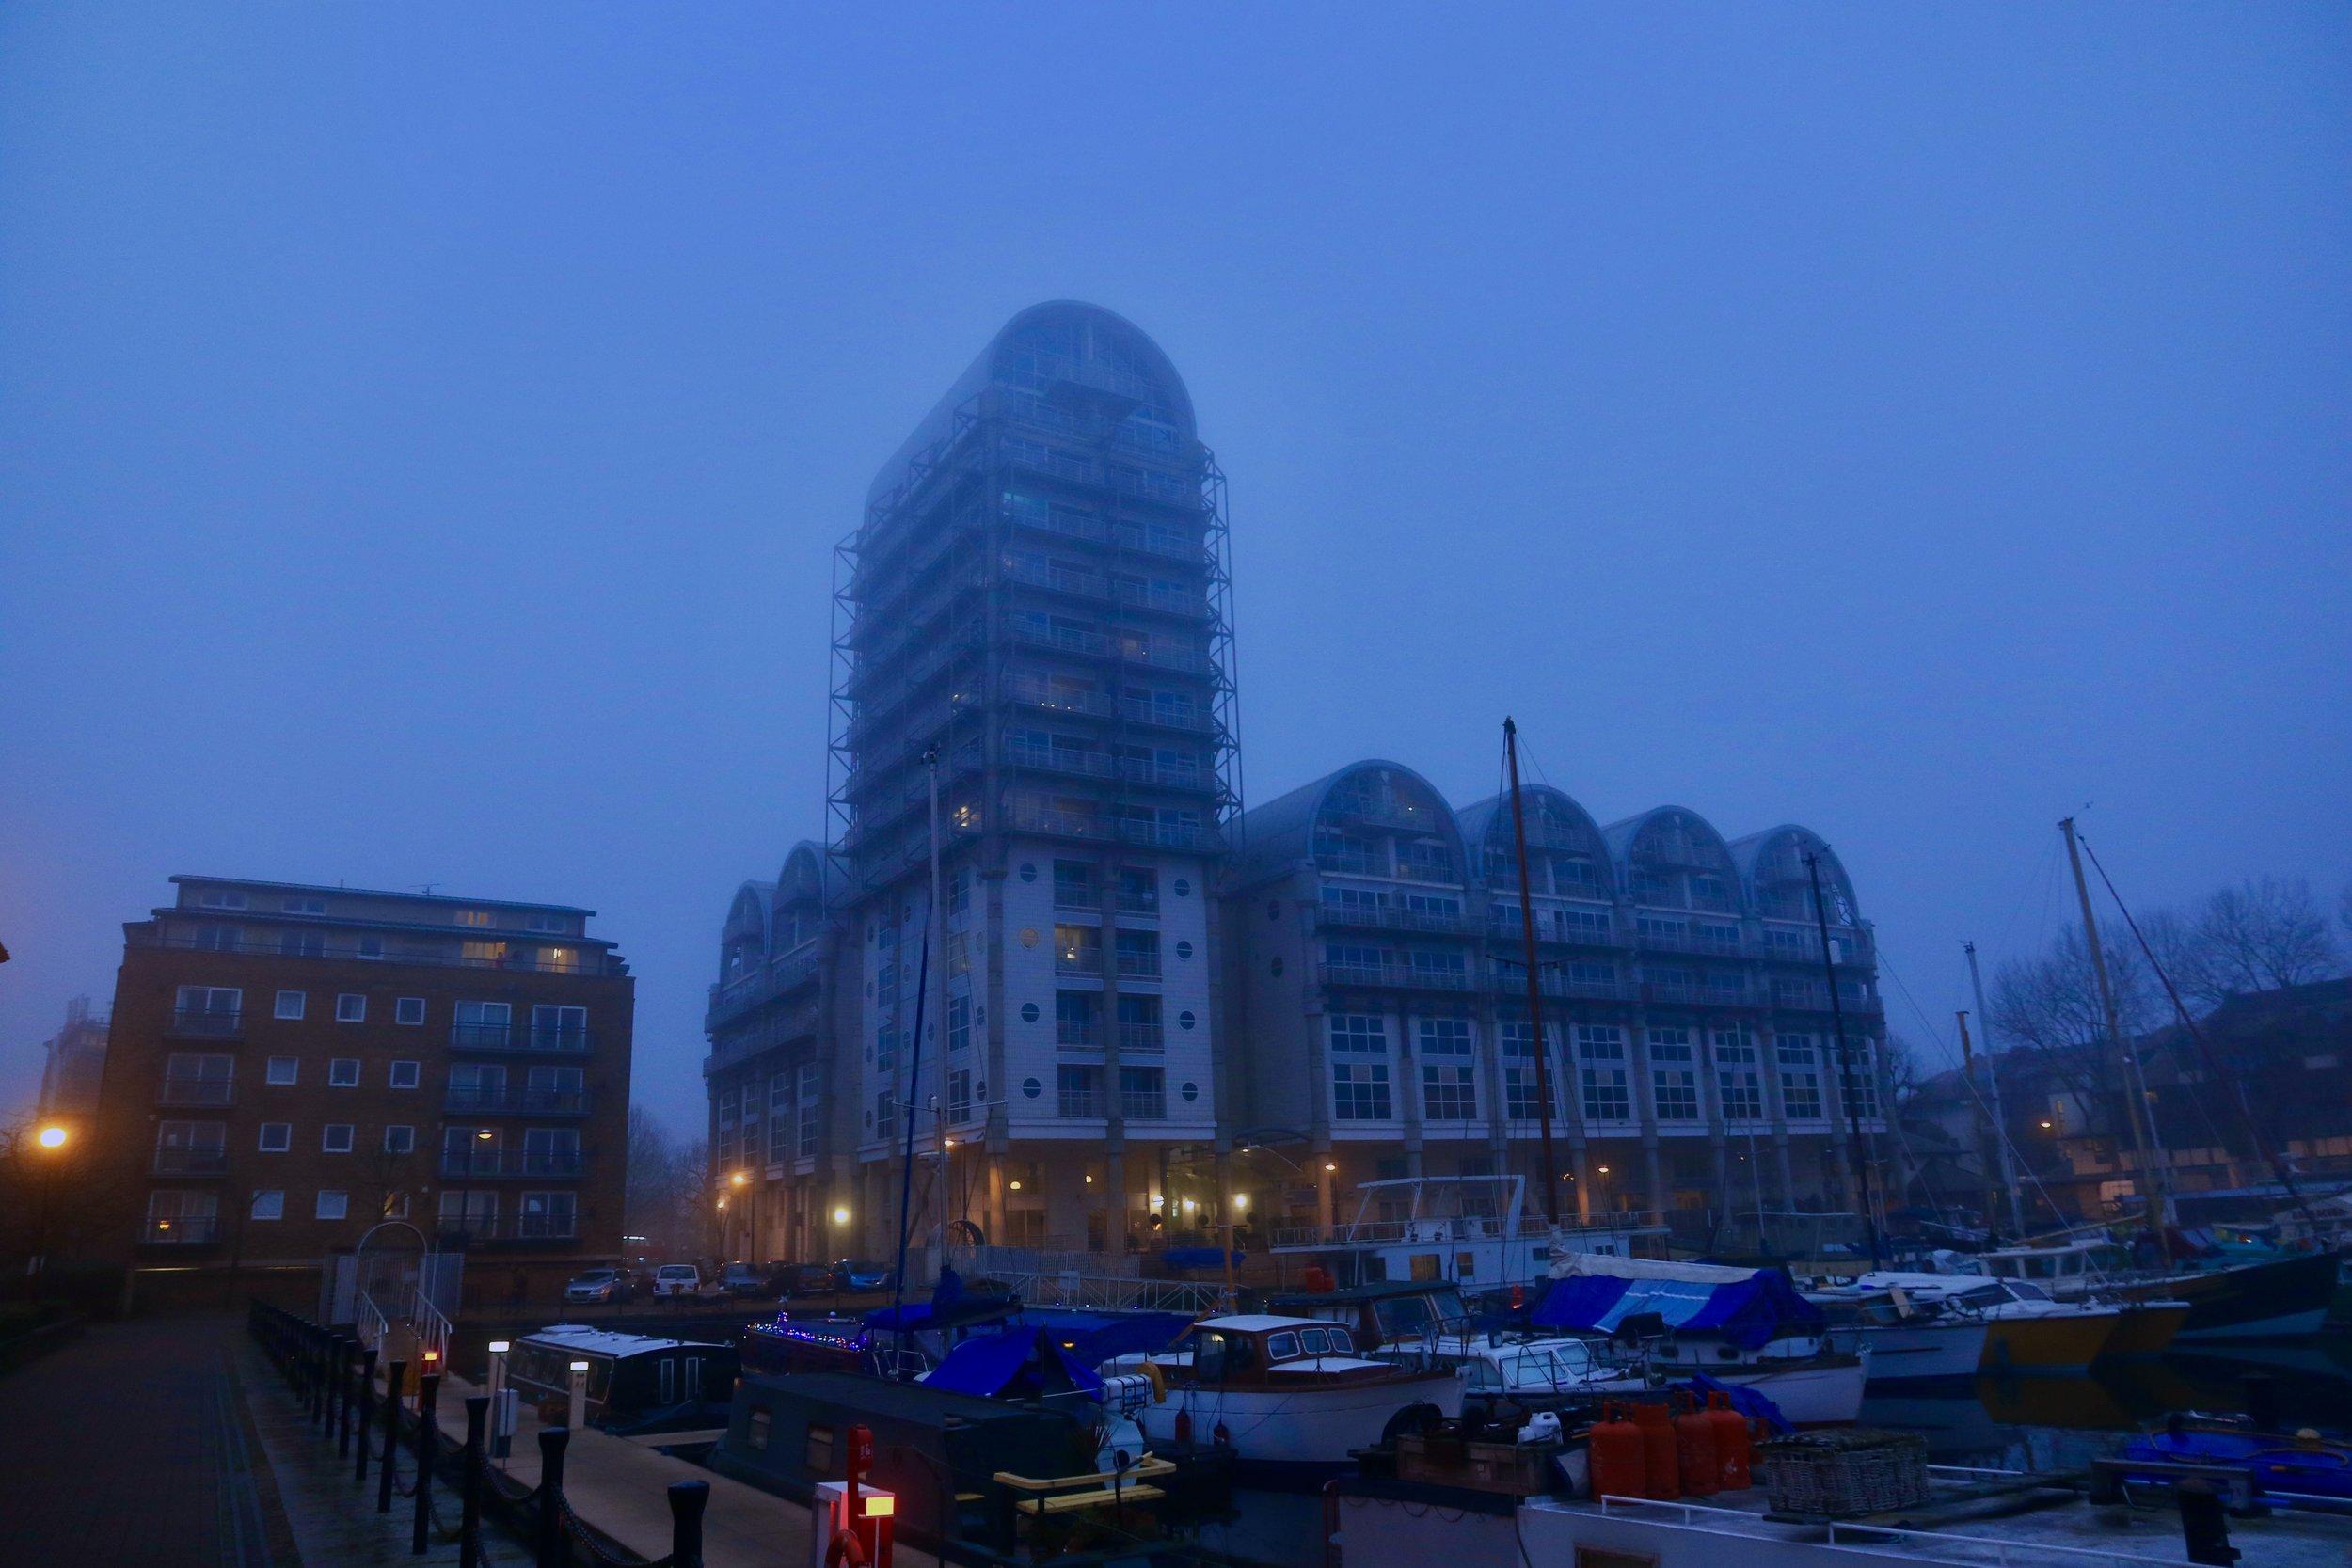 Surrey Quays, London.